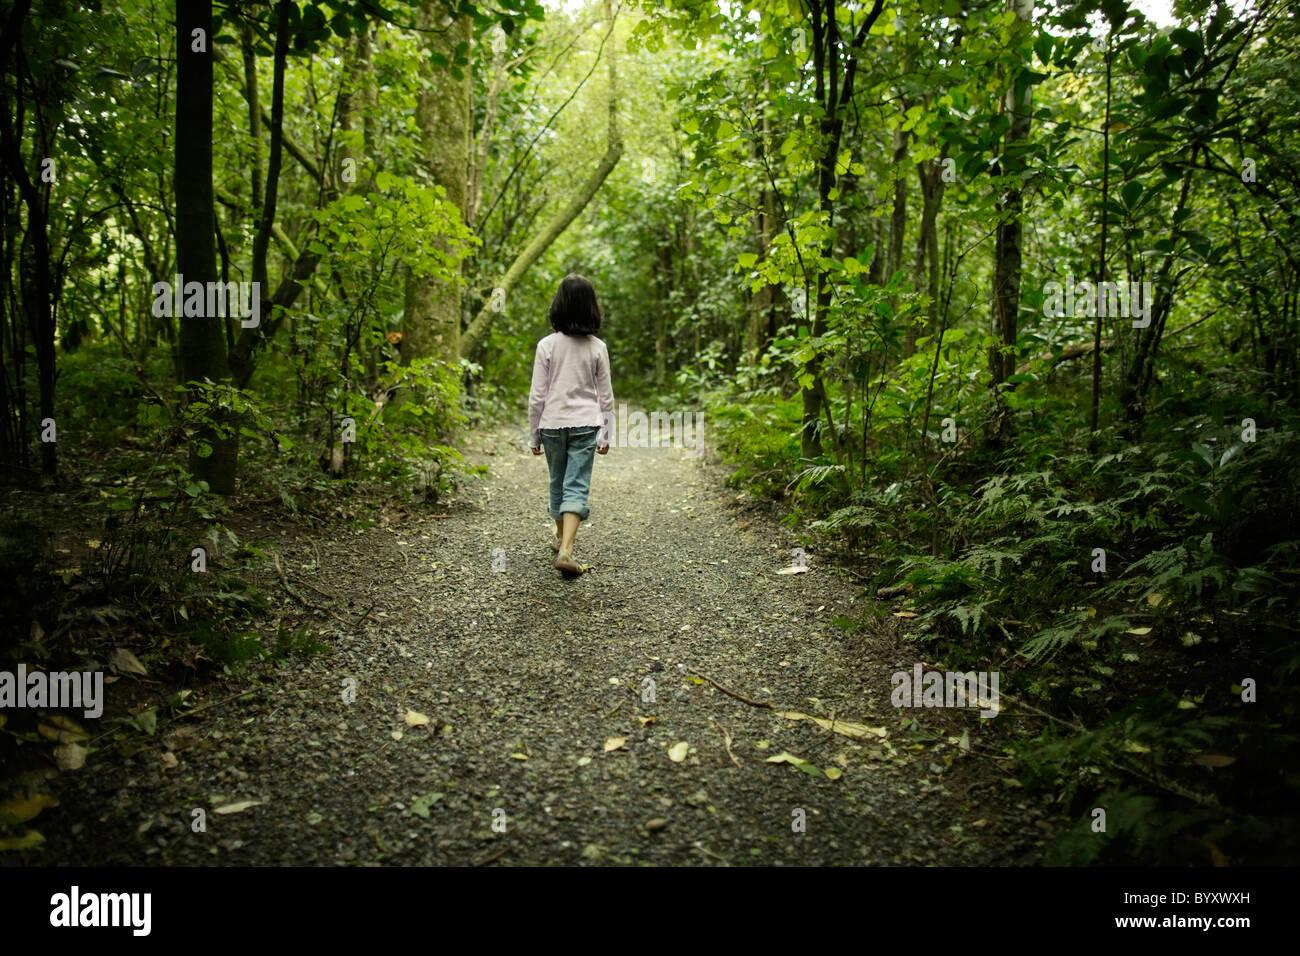 Girl walks along woodland path, New Zealand. - Stock Image